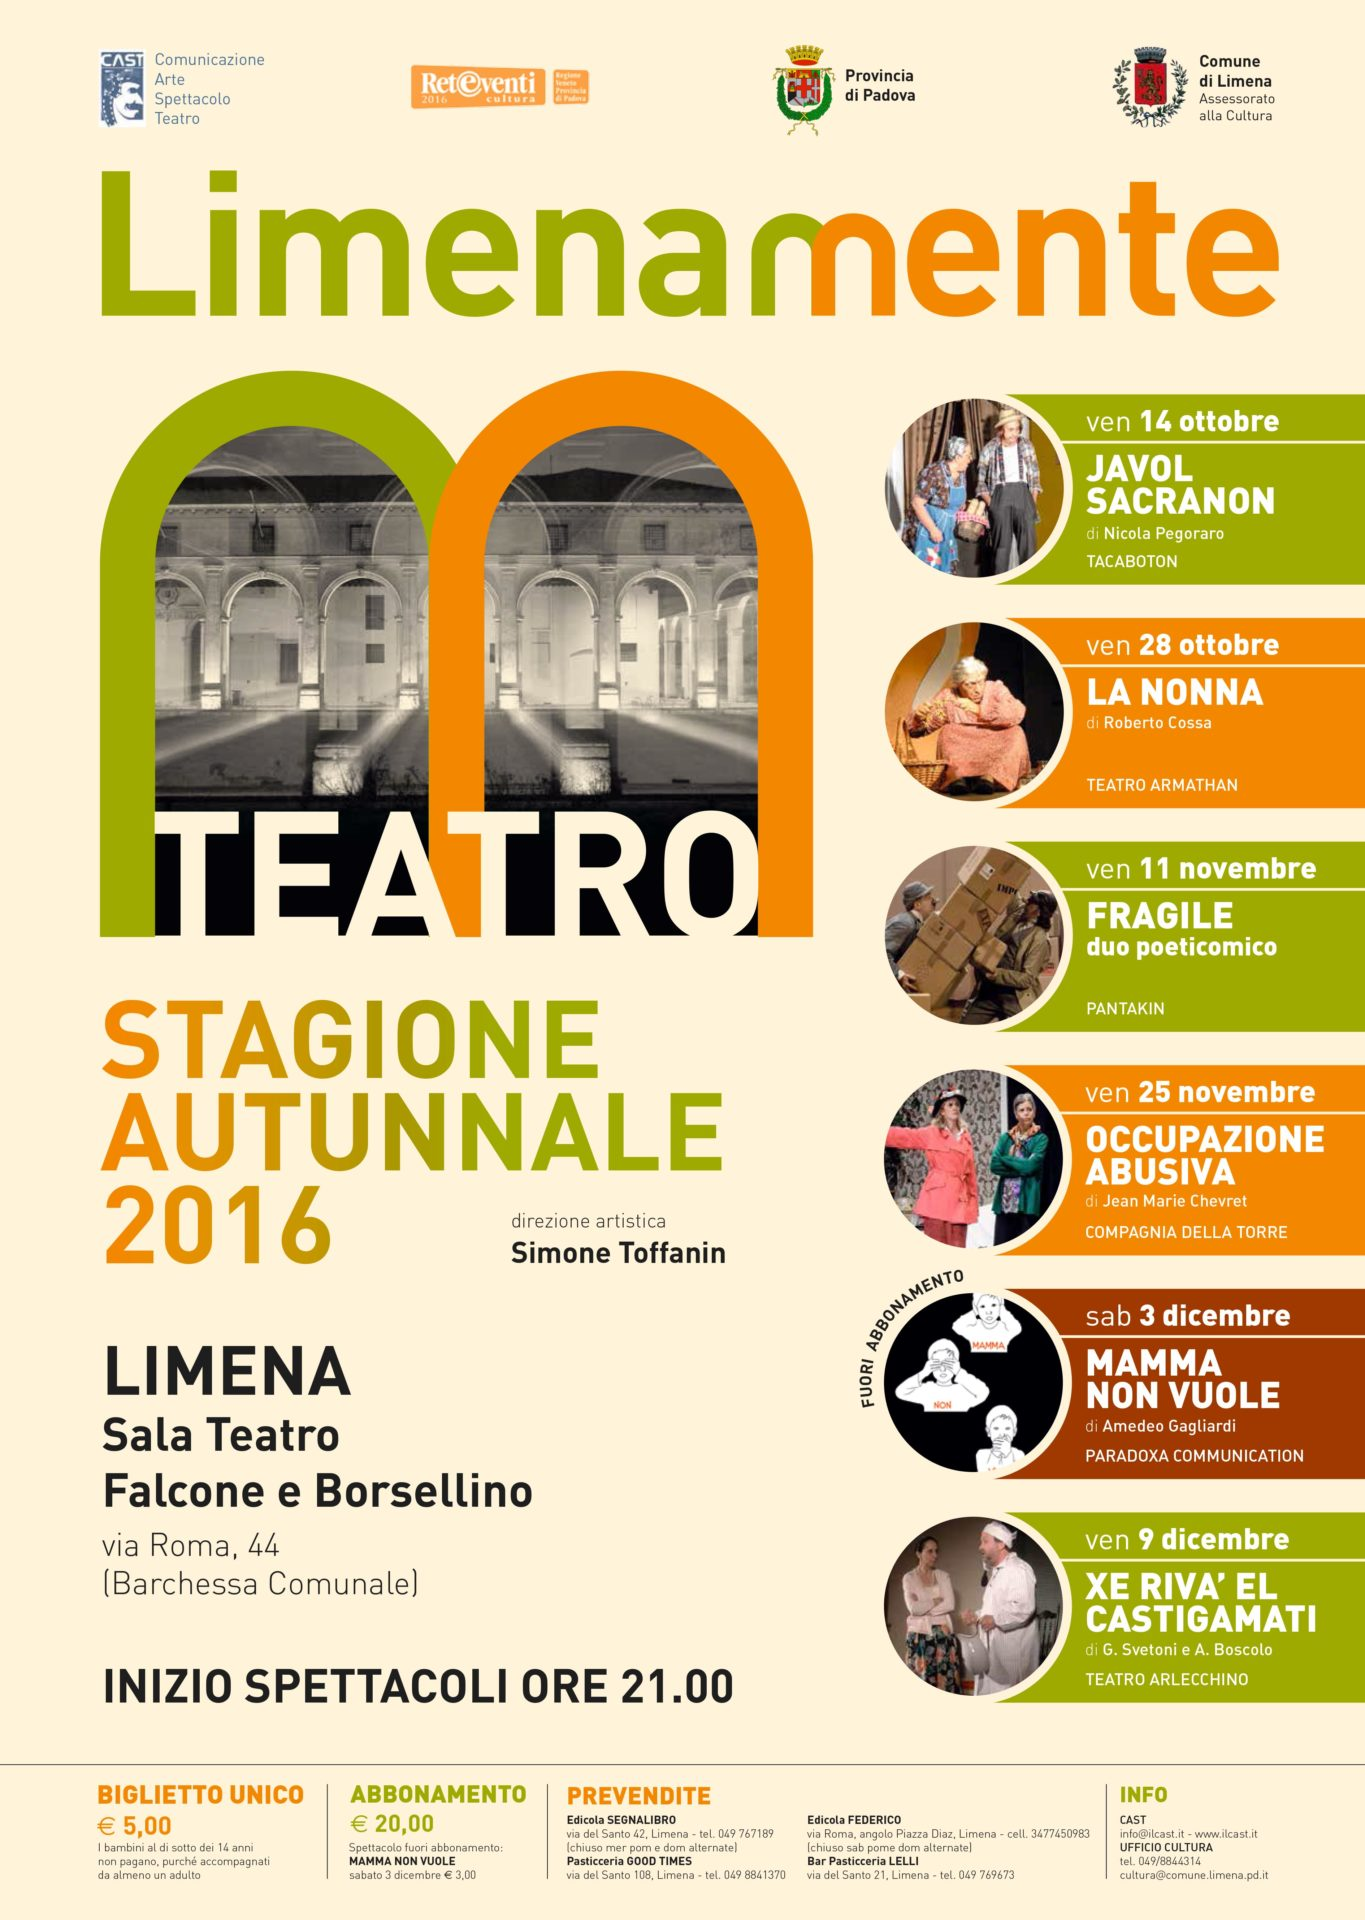 Limenamente Teatro primavera 2017